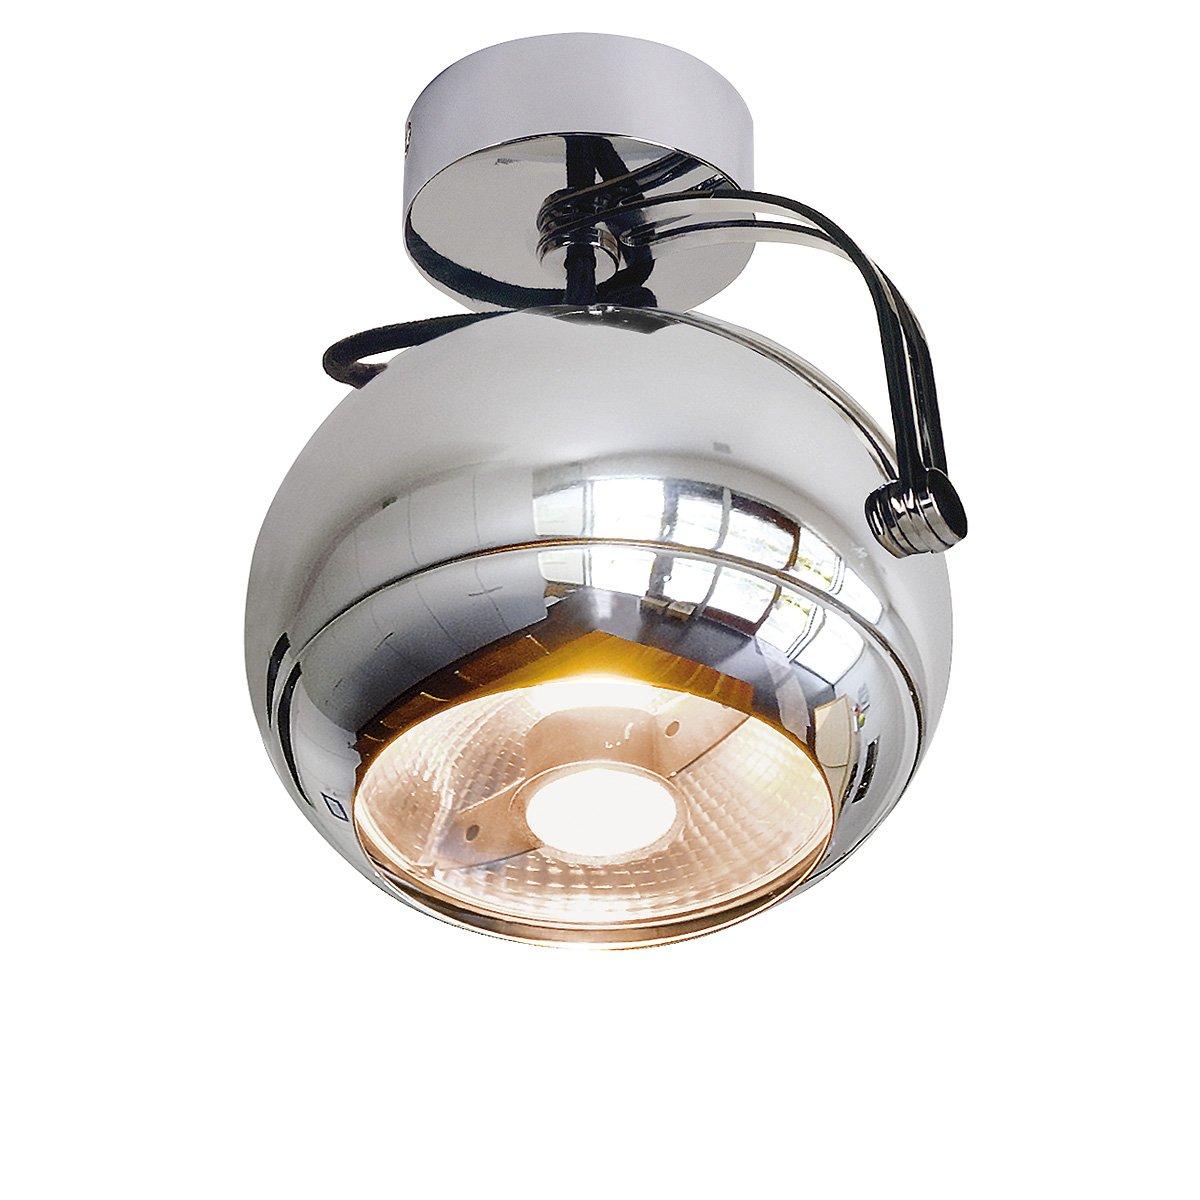 weiss//chrom max GU10 50W SLV LIGHT EYE BALL GU10 Pendelleuchte